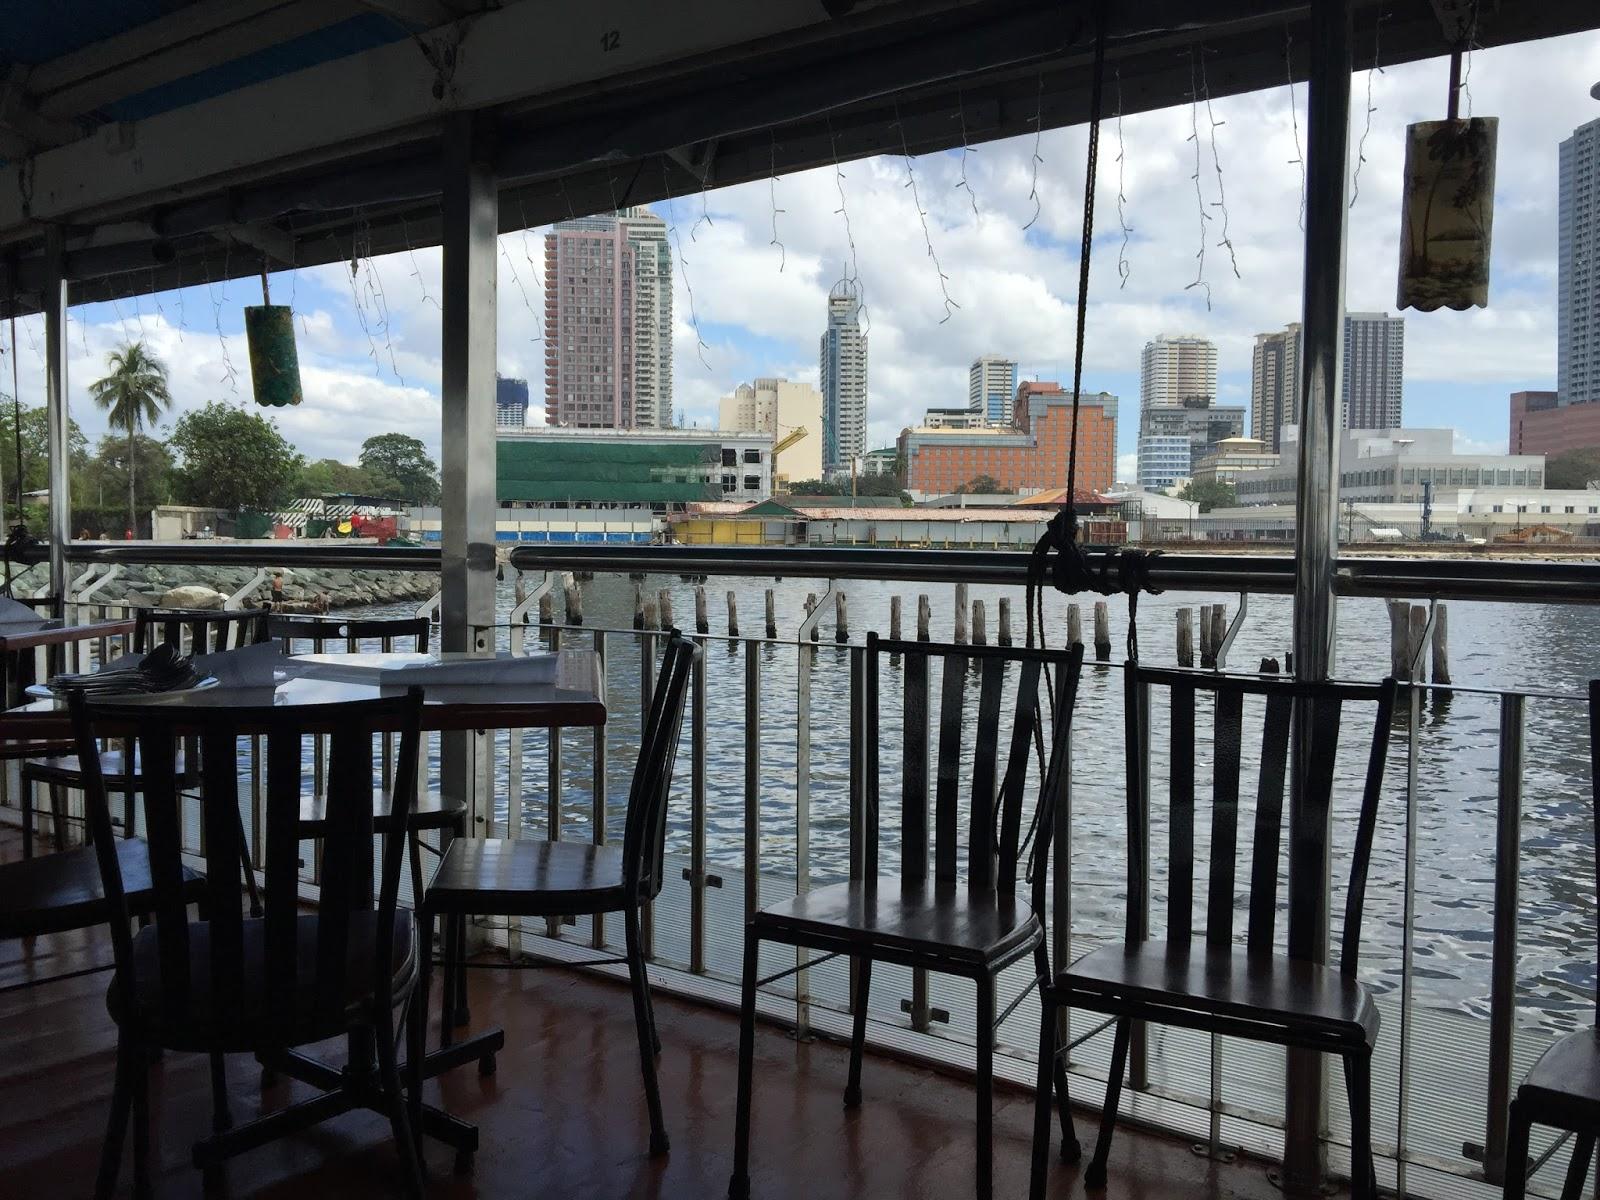 Harbor View Restaurant Manila - The Letters In November